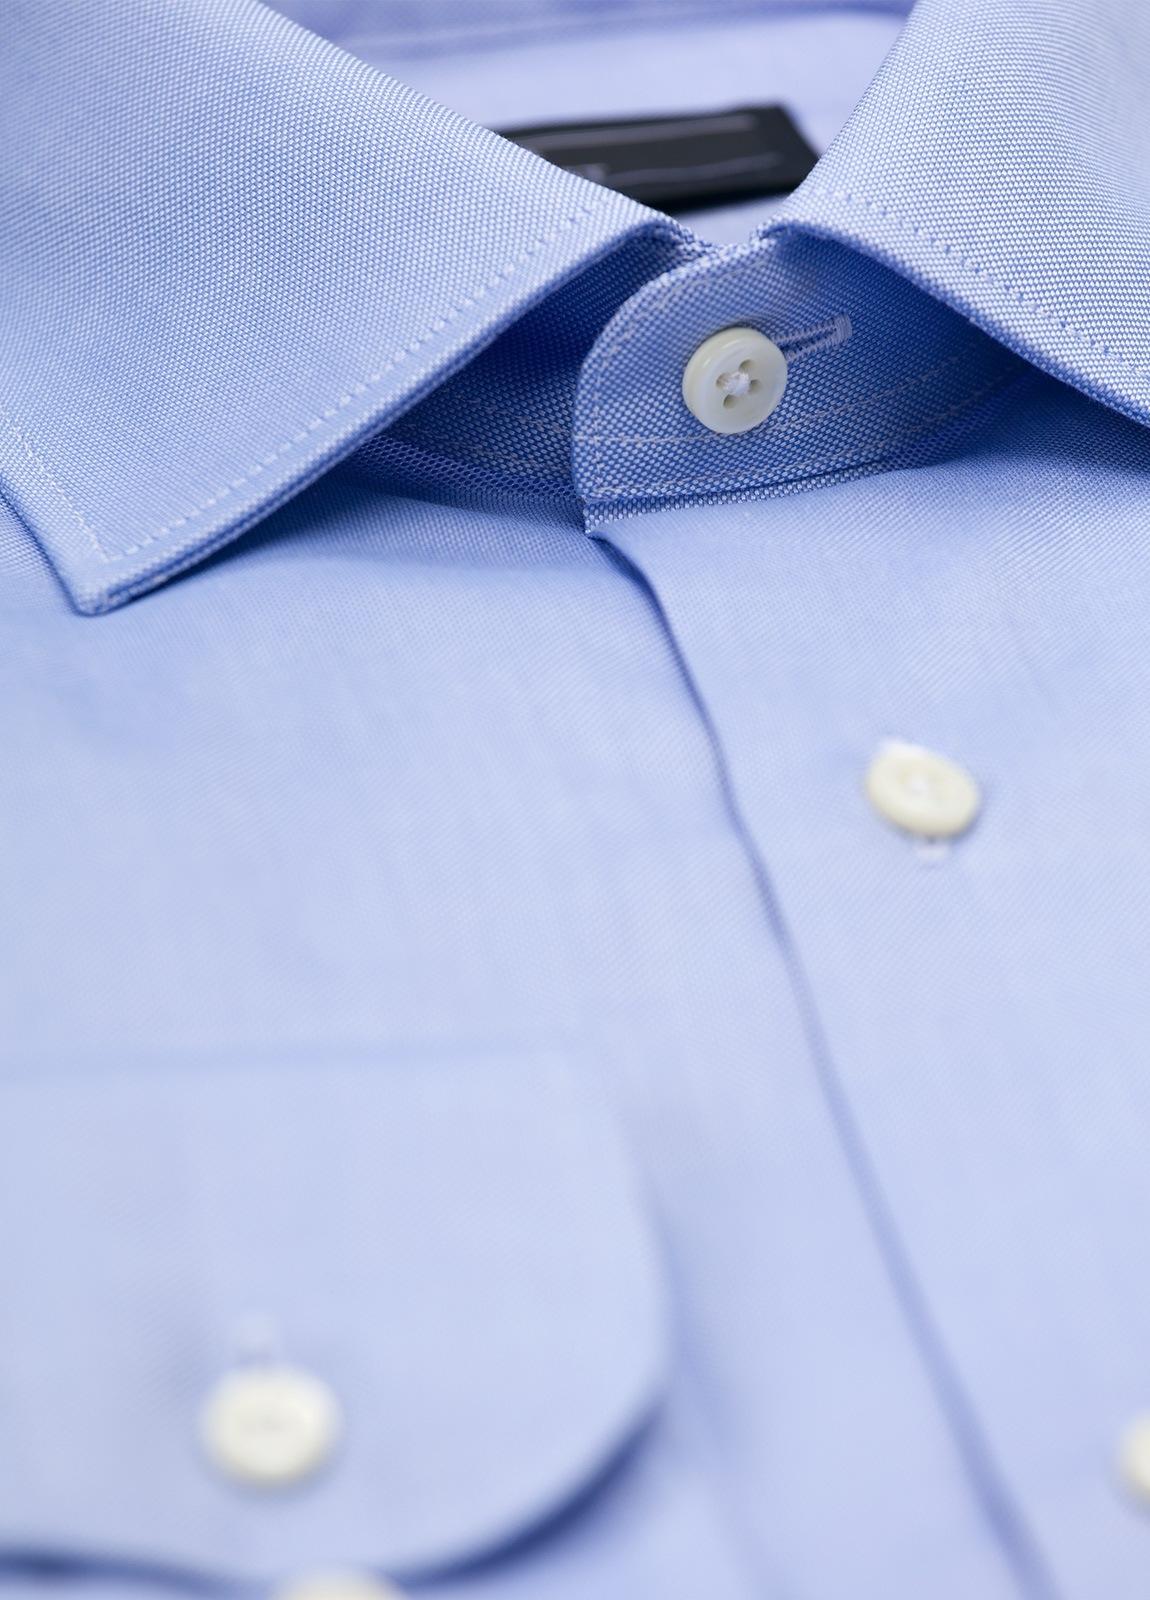 Camisa Formal Wear SLIM FIT cuello italiano modelo ROMA liso color celeste. 100% Algodón Pin Point. - Ítem1